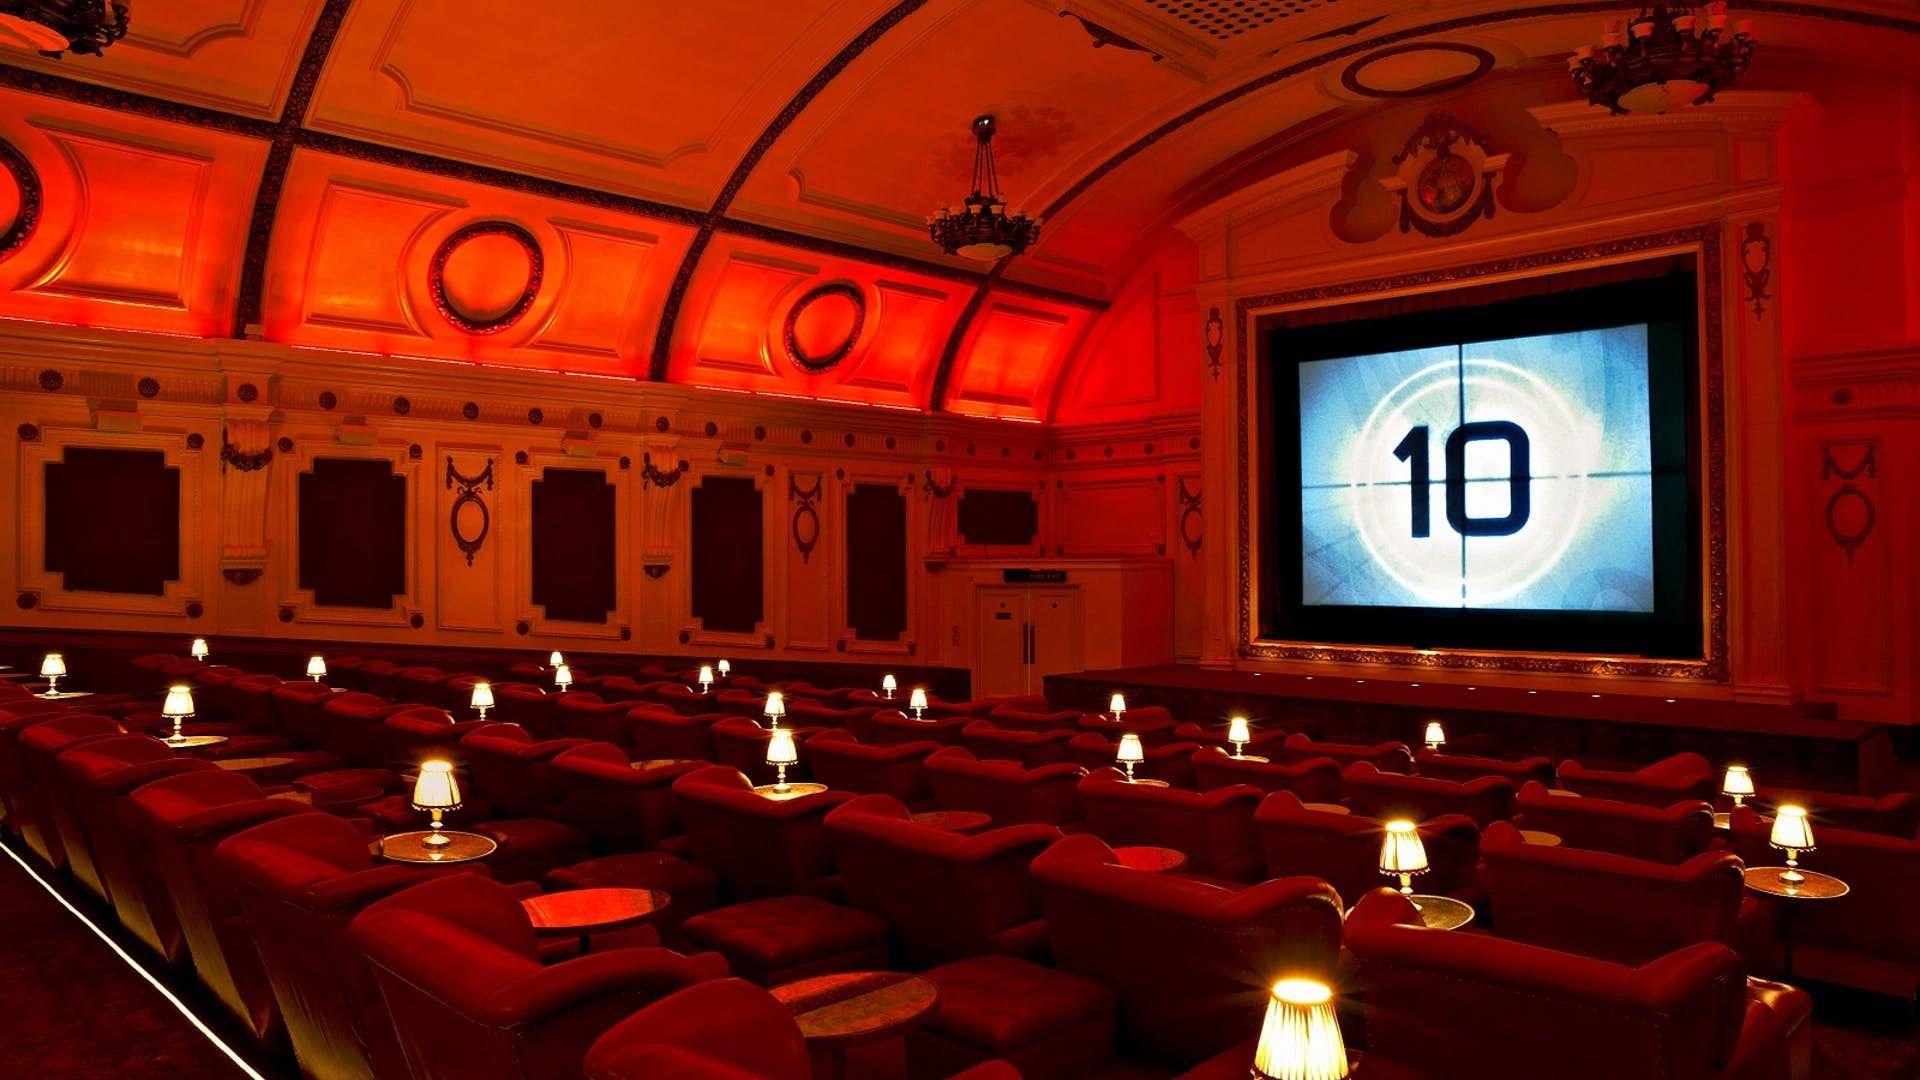 Movie Theater hd wallpaper 1080